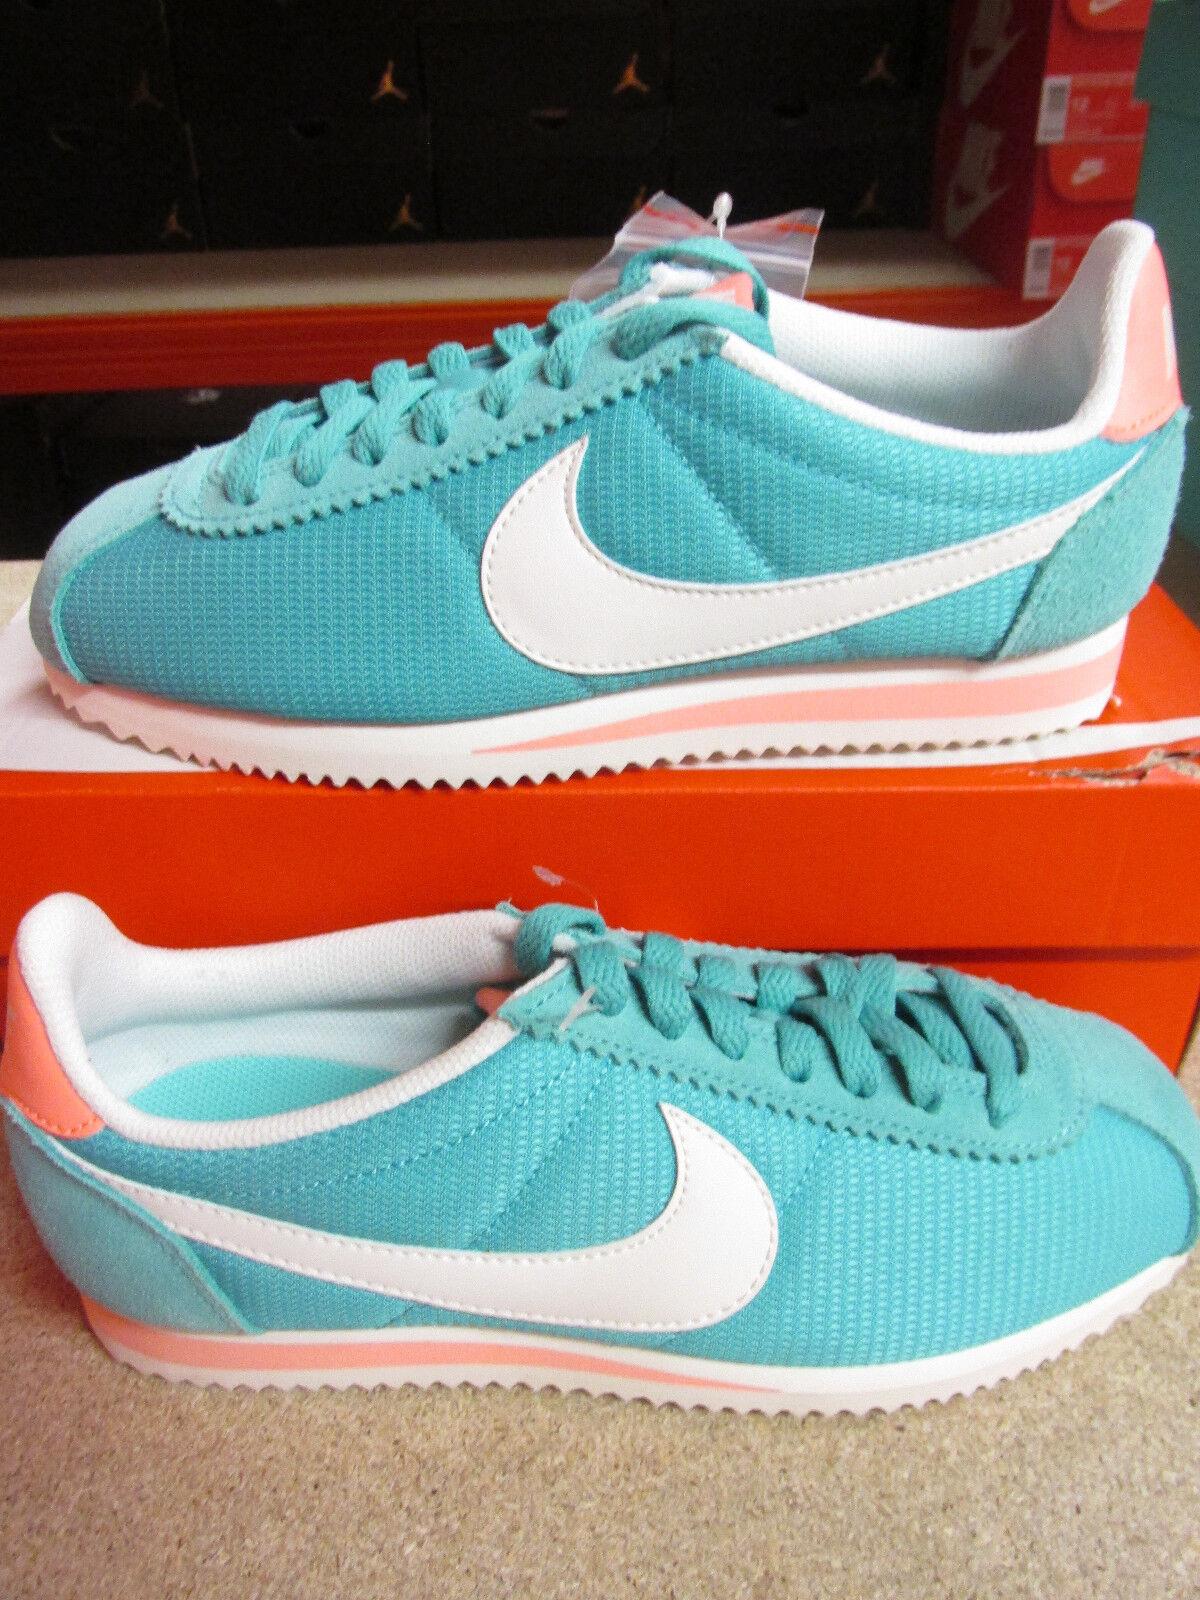 Nike Klassisch Cortez Txt Damen Turnschuhe Laufschuhe Turnschuhe 844892 310 Turnschuhe Damen 55e664